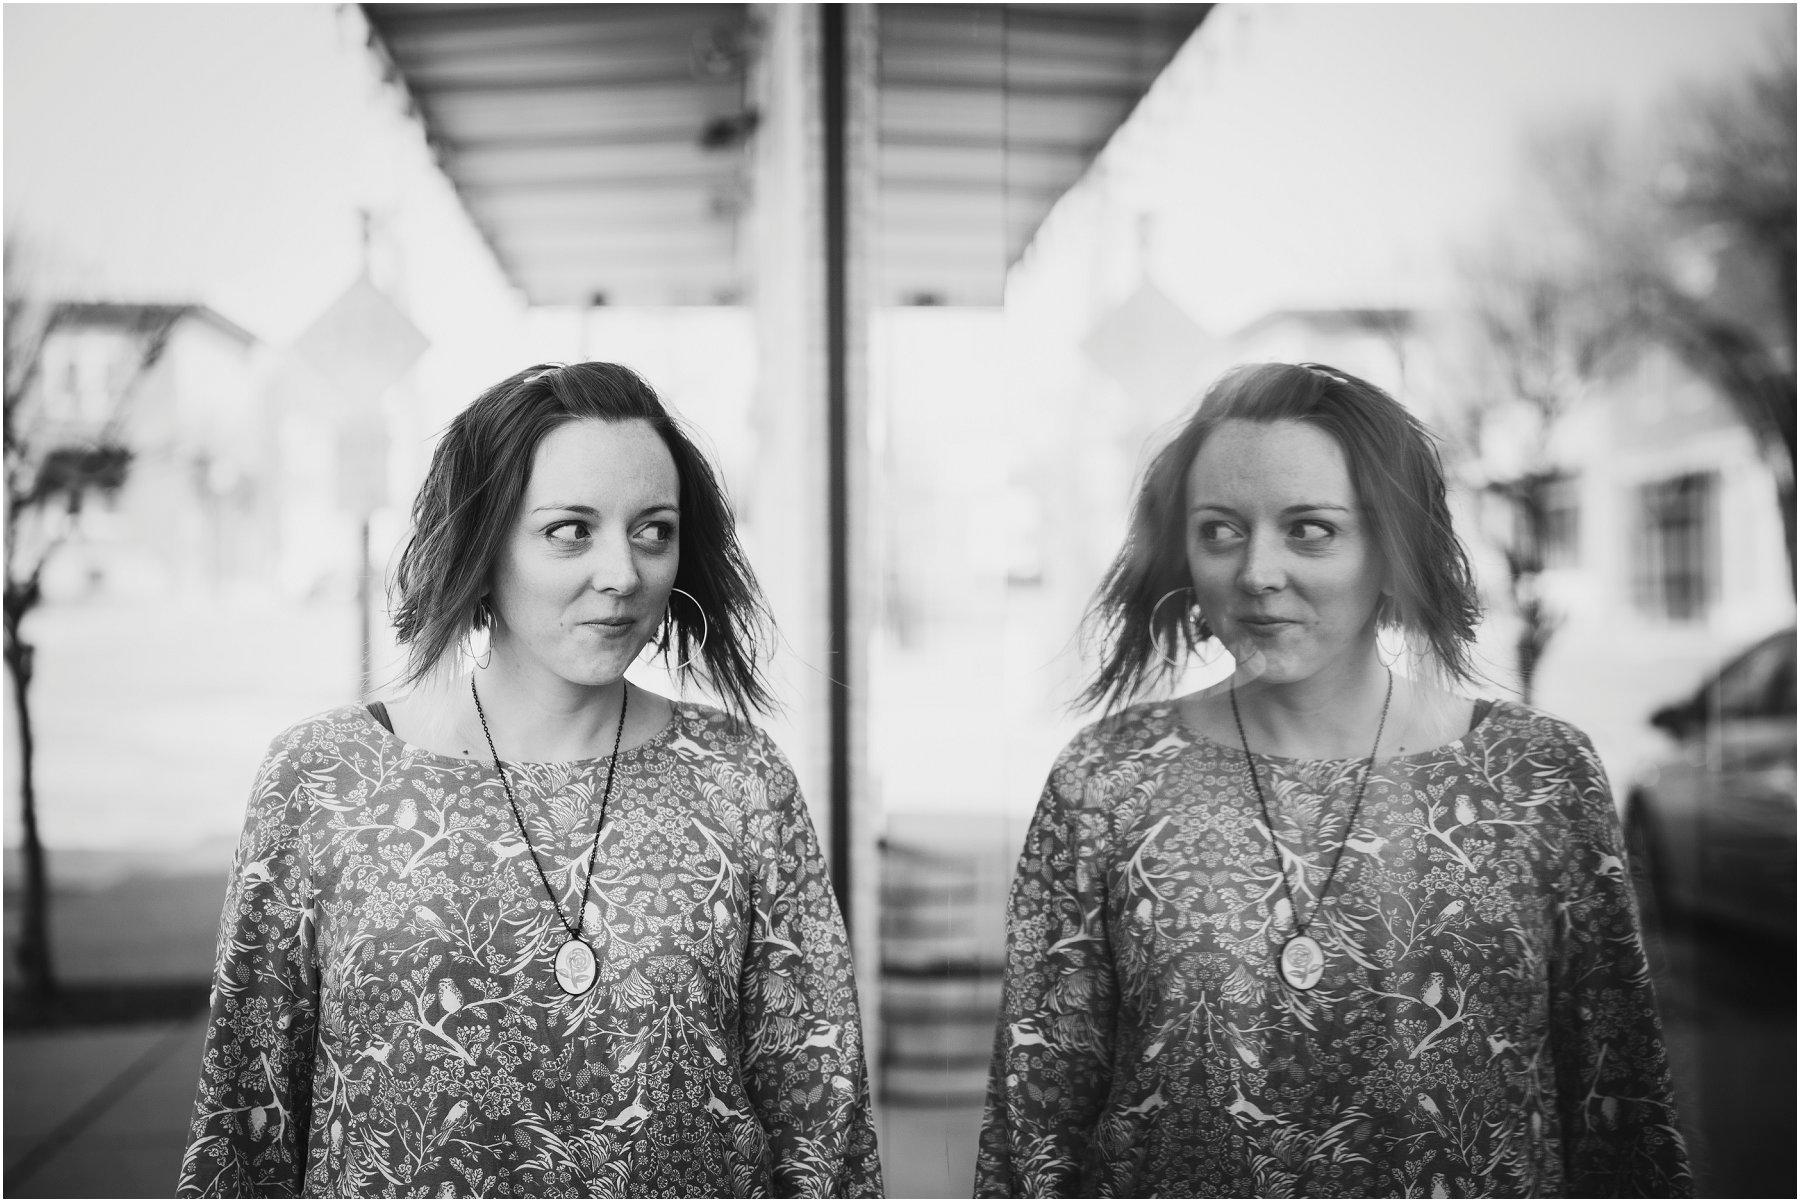 SHERRYLANEPHOTOGRAPHY_STLOUISHEADSHOTS_Natalie___2018 (8).jpg